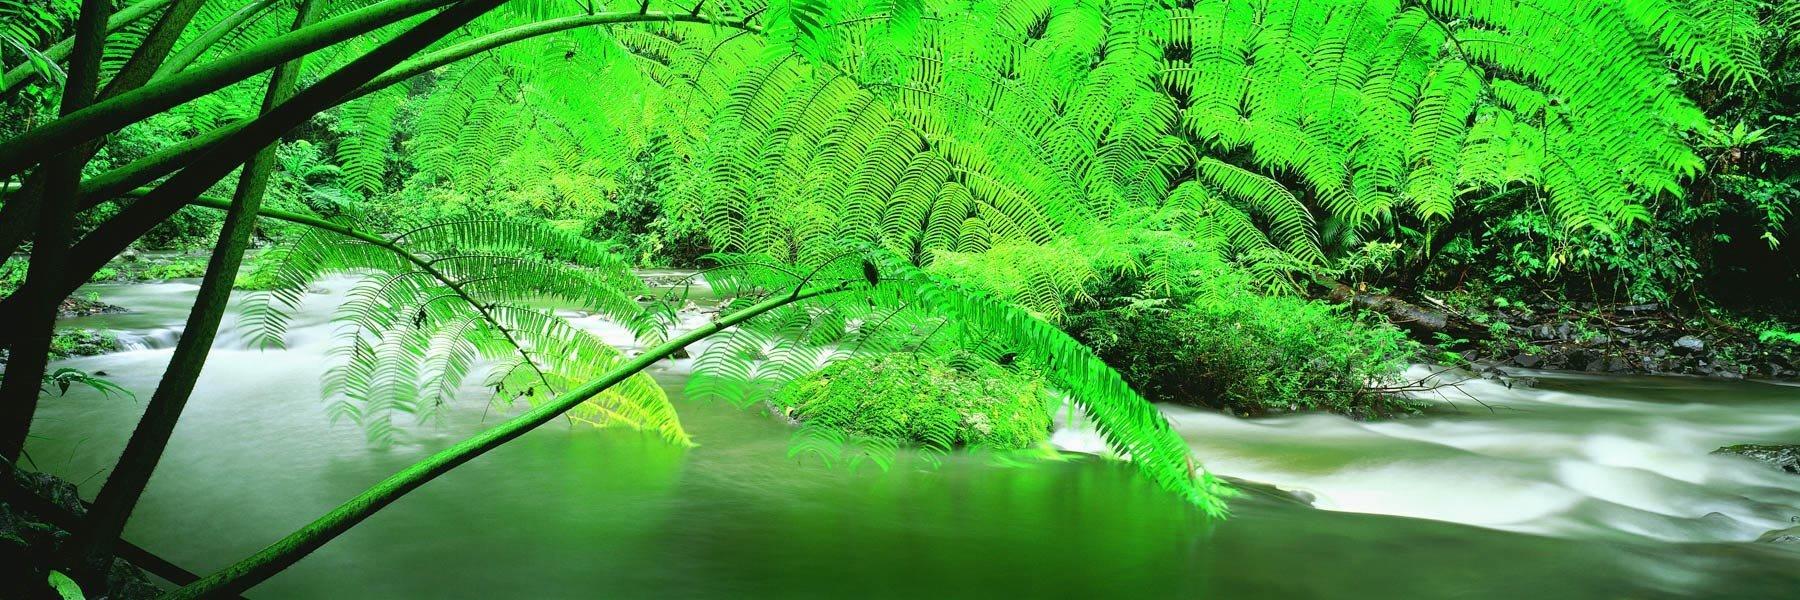 Lush ferns framing Douglas Creek in Palmerston National Park, Qld, Australia.